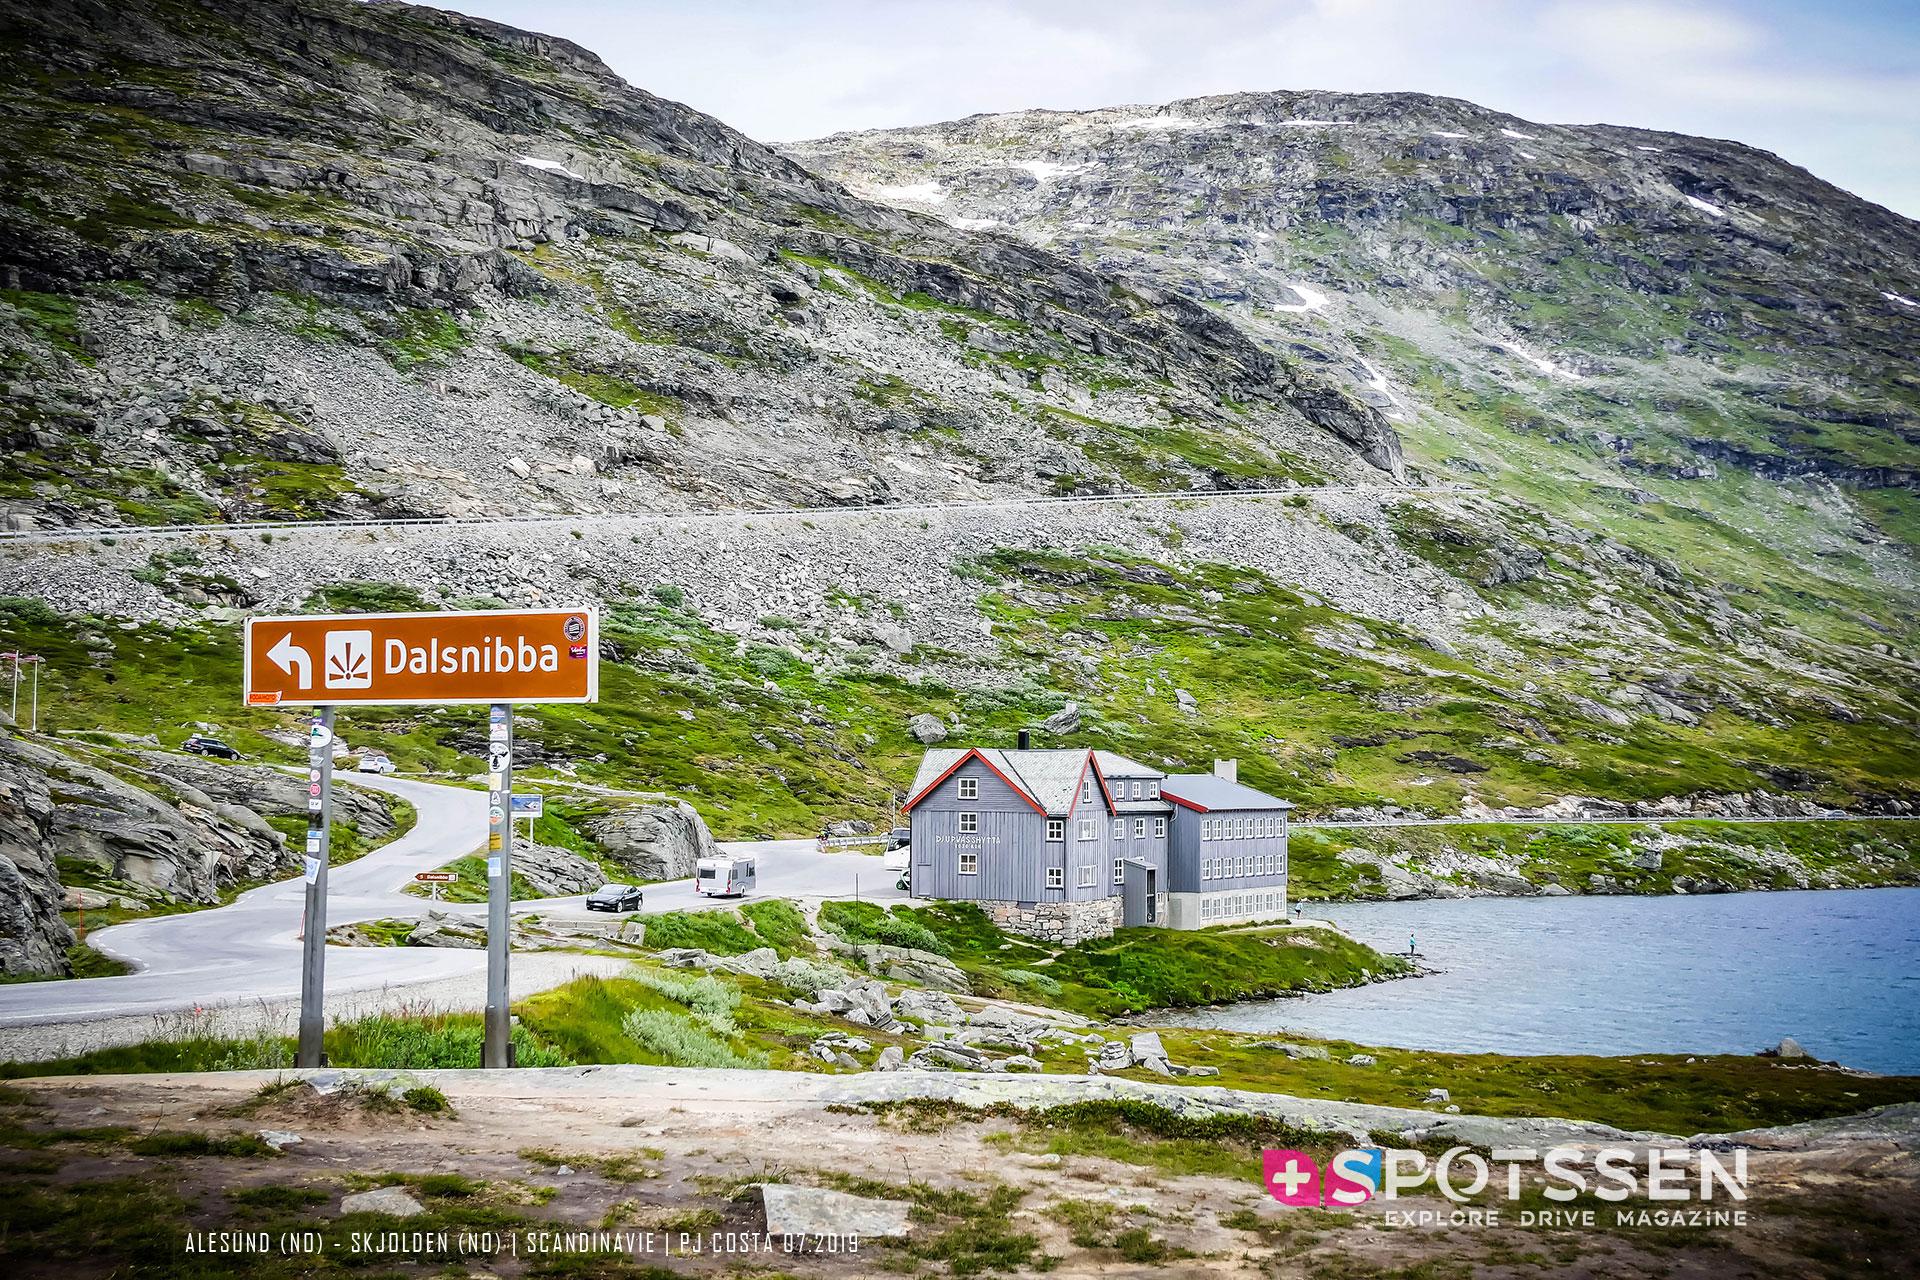 2019, alesund, skjolden, trolls, fjords, norvège